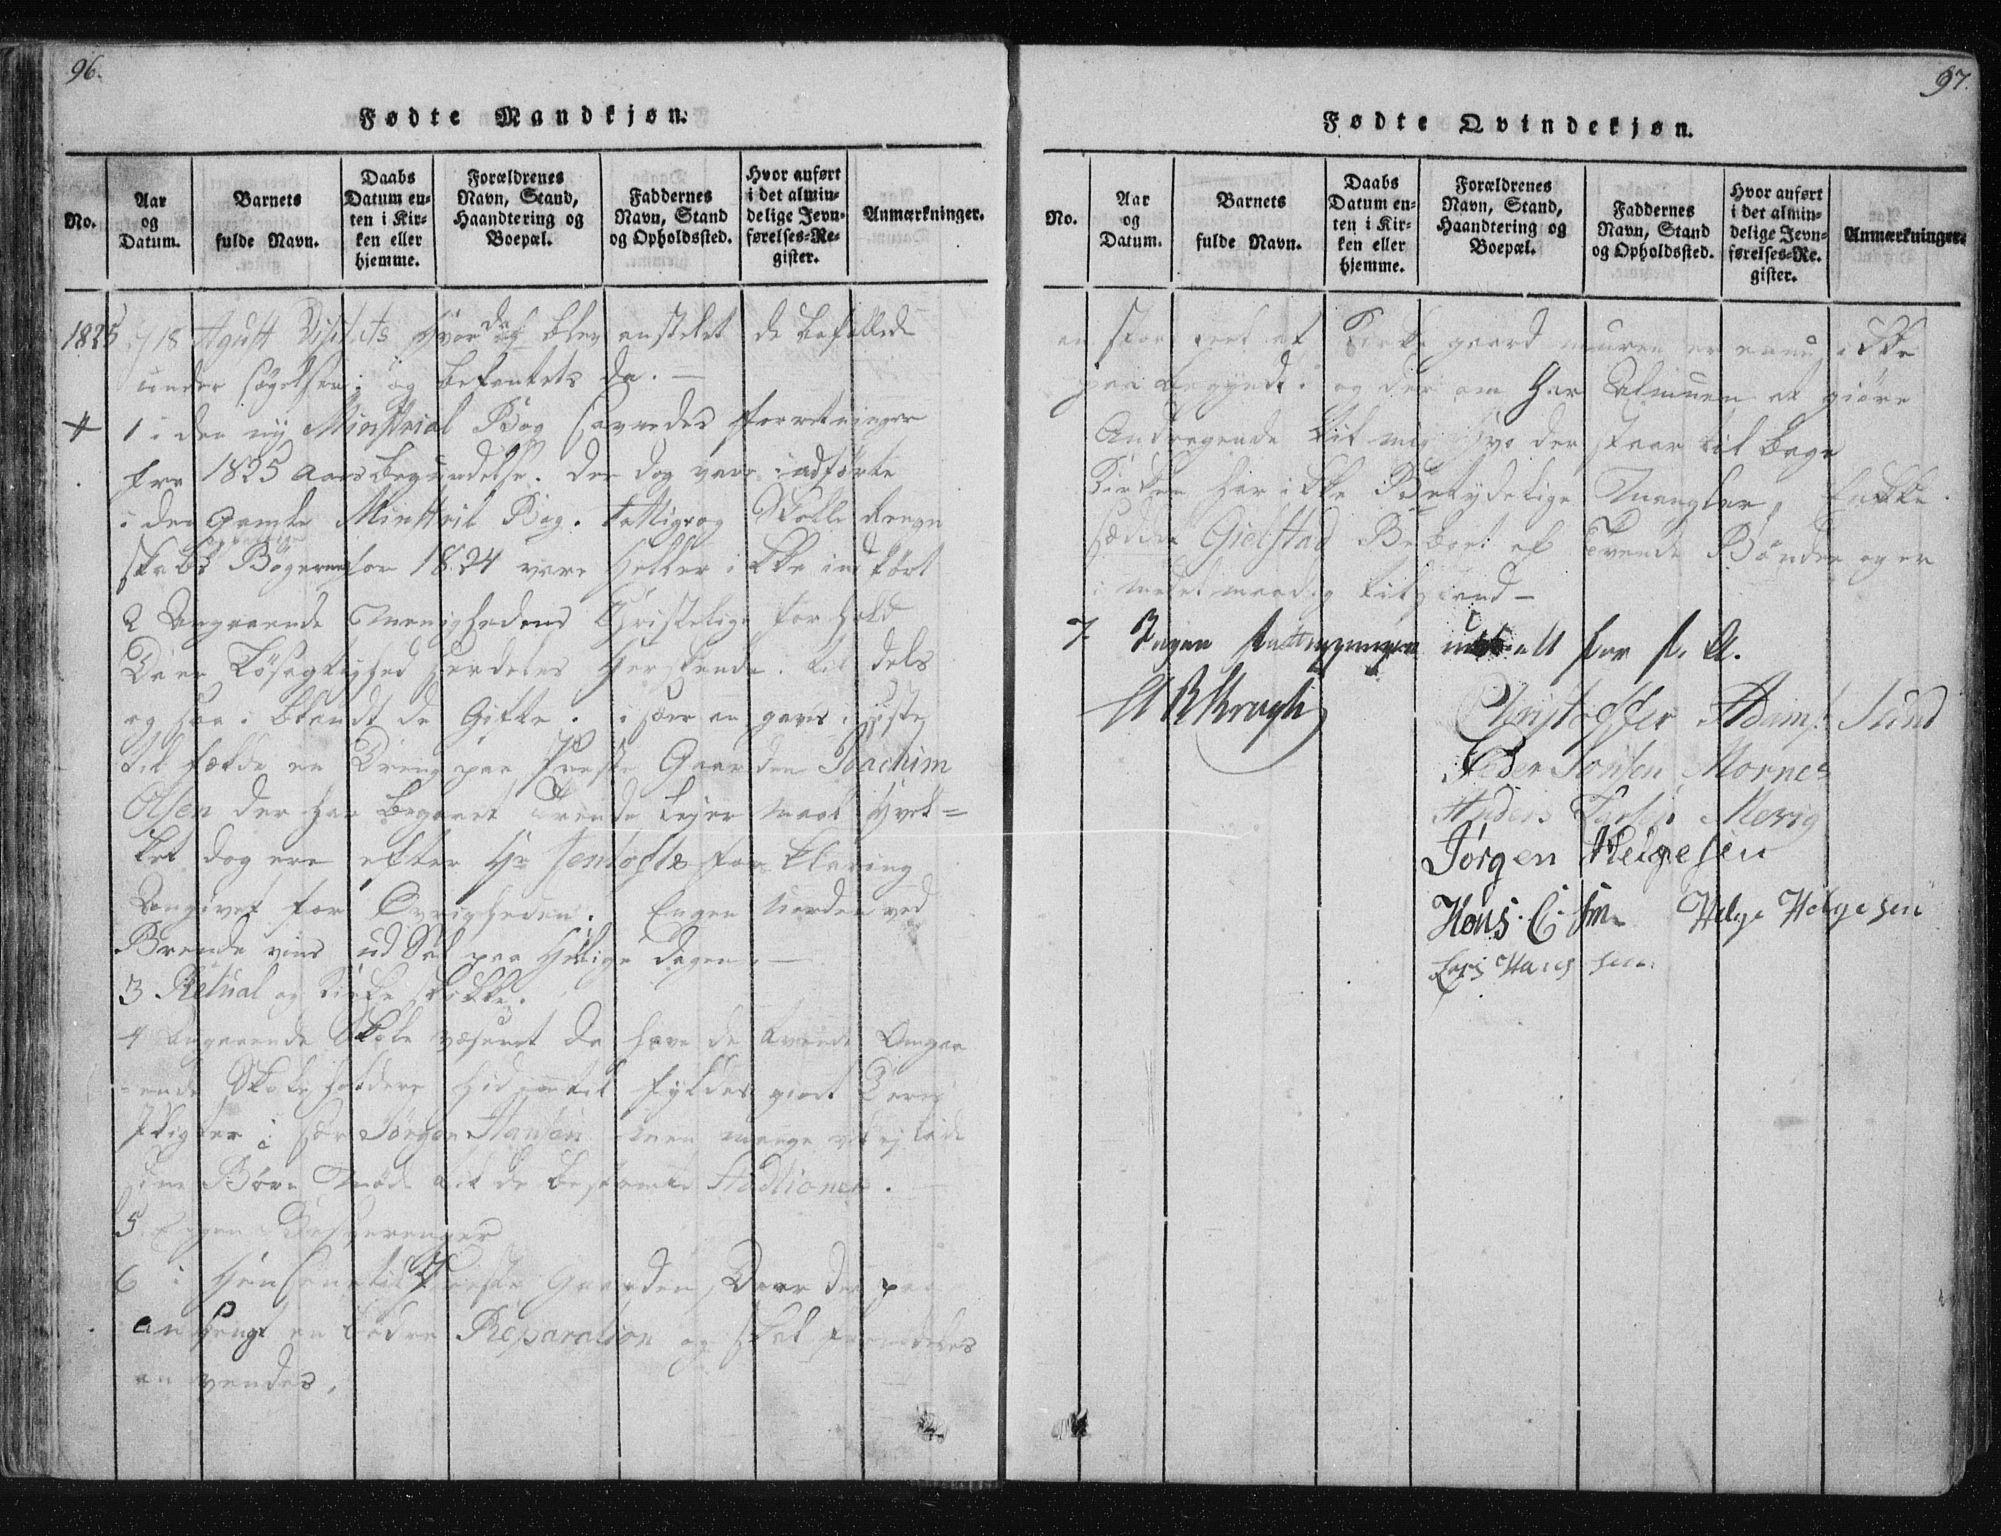 SAT, Ministerialprotokoller, klokkerbøker og fødselsregistre - Nordland, 805/L0096: Ministerialbok nr. 805A03, 1820-1837, s. 96-97